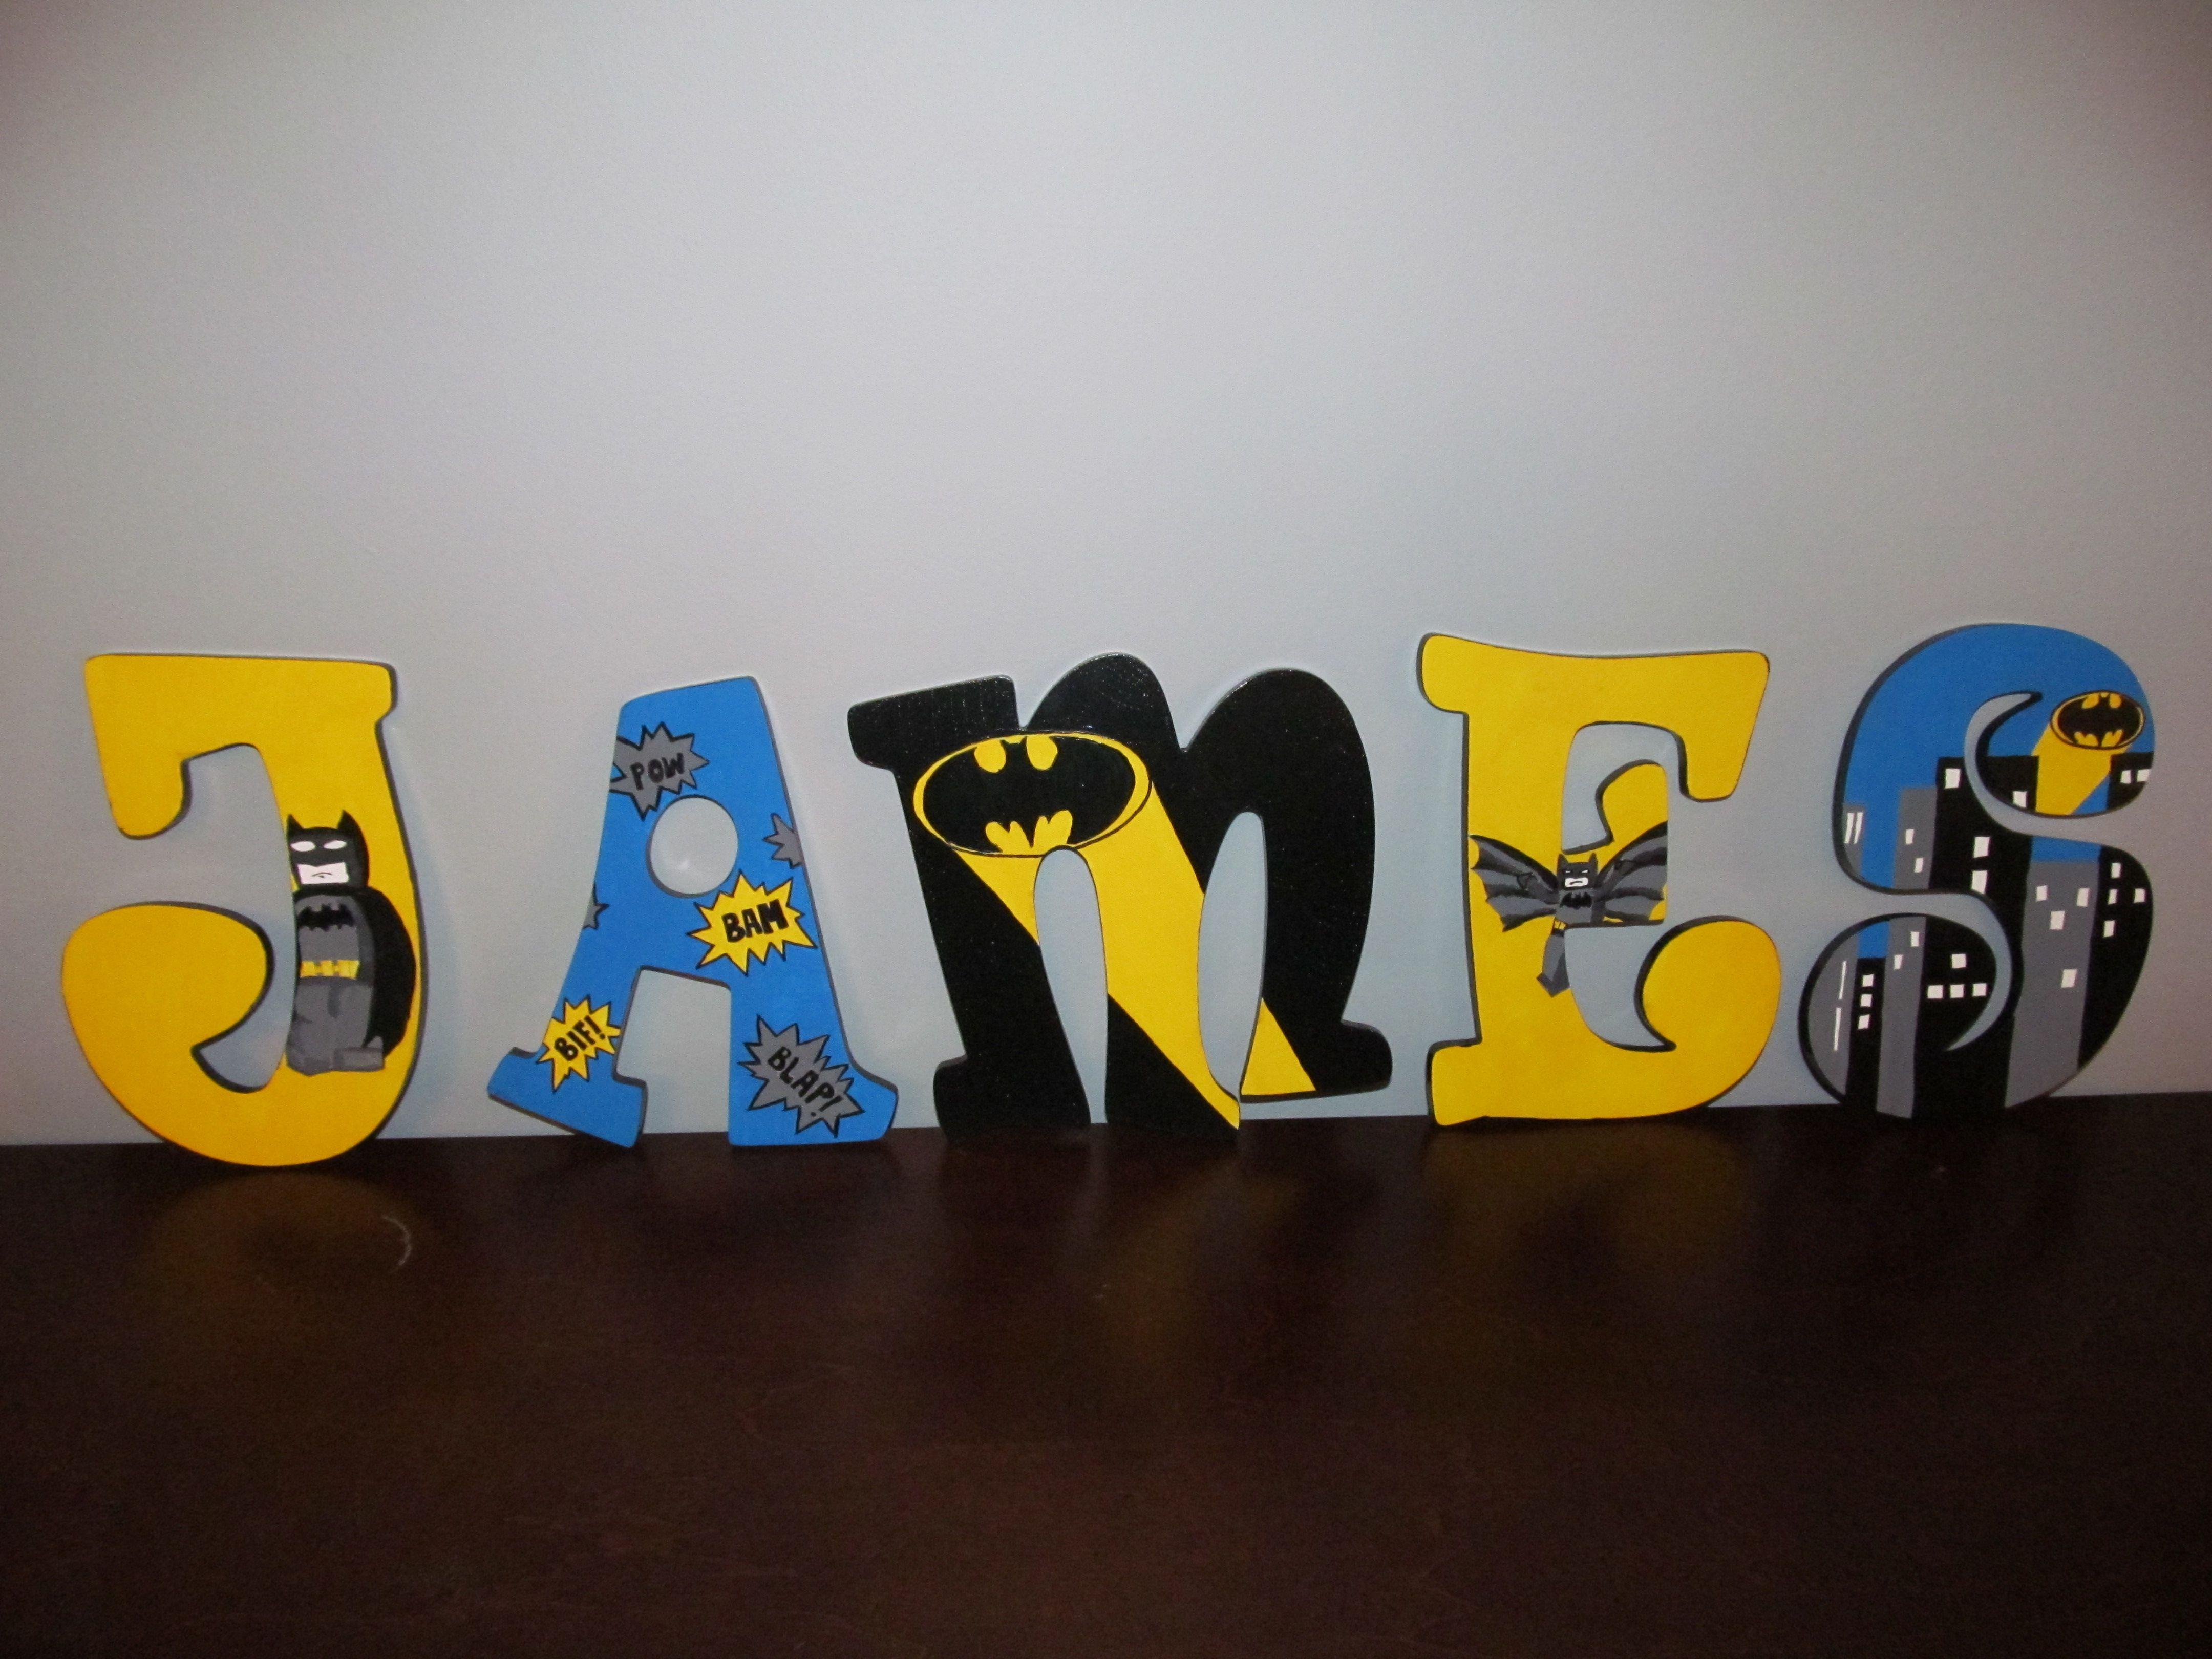 Name Letters Made With Lego Bricks Birthday Decor Shelf Decor Custom Brick Letter Sign Batman Inspired Kids Room Decor